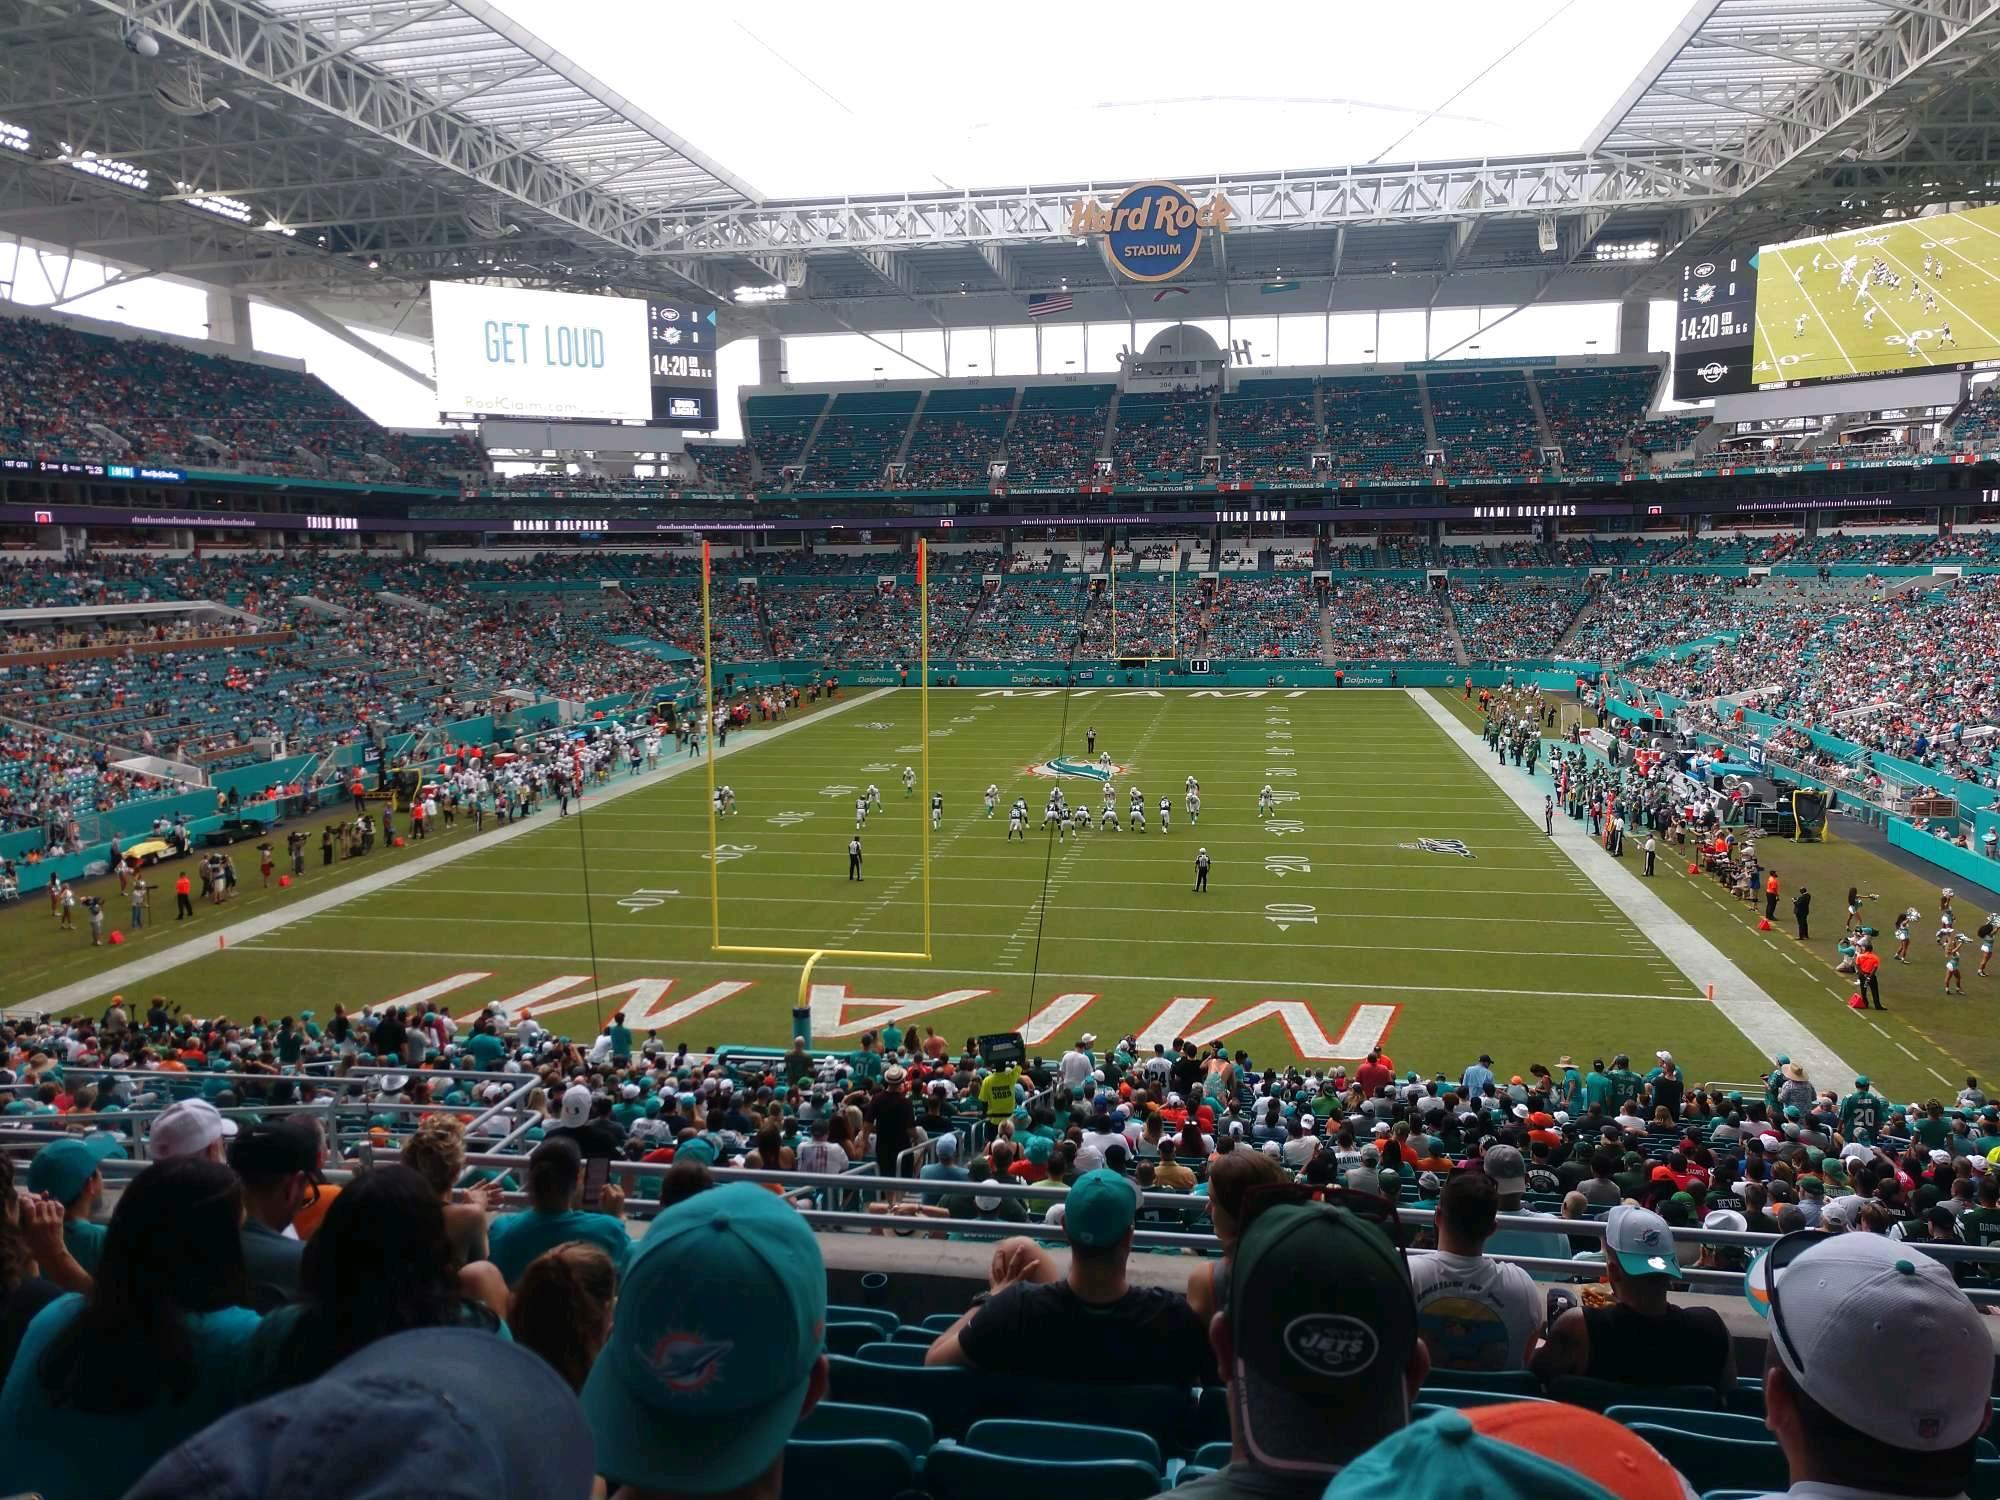 Hard Rock Stadium Section 231 Row 7 Seat 17